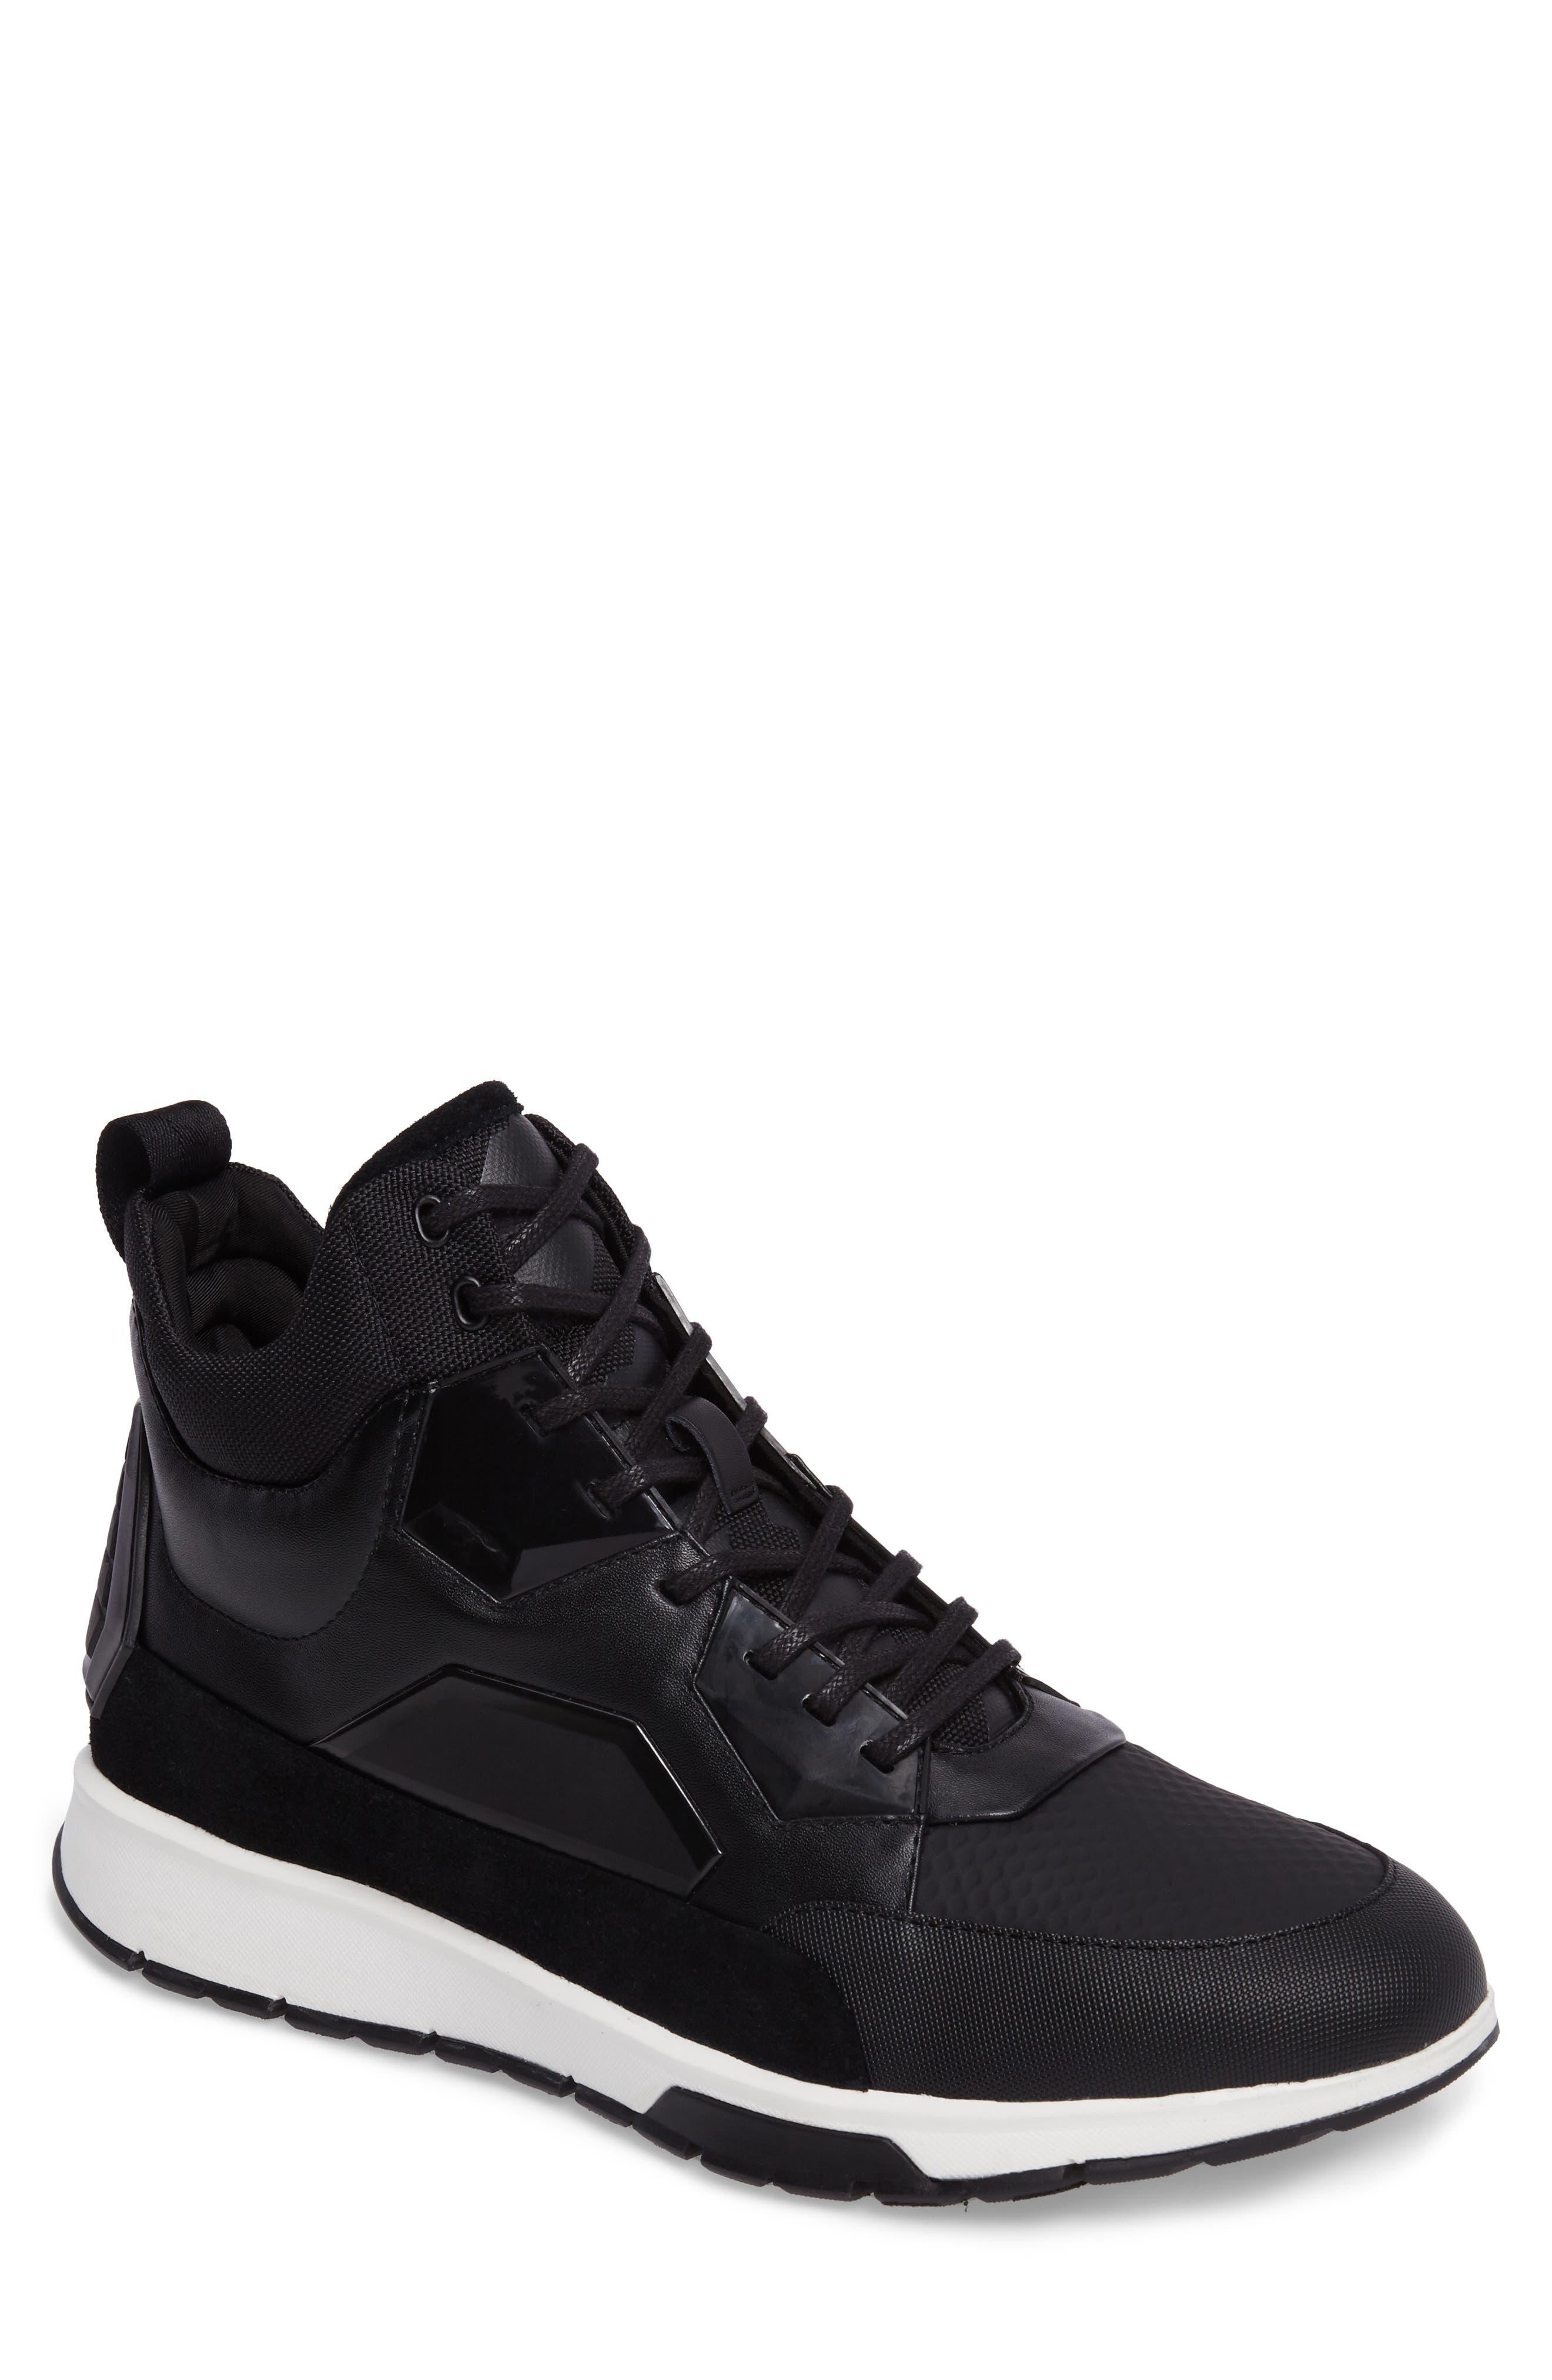 Alternate Image 1 Selected - Calvin Klein Kovan City Sneaker (Men)